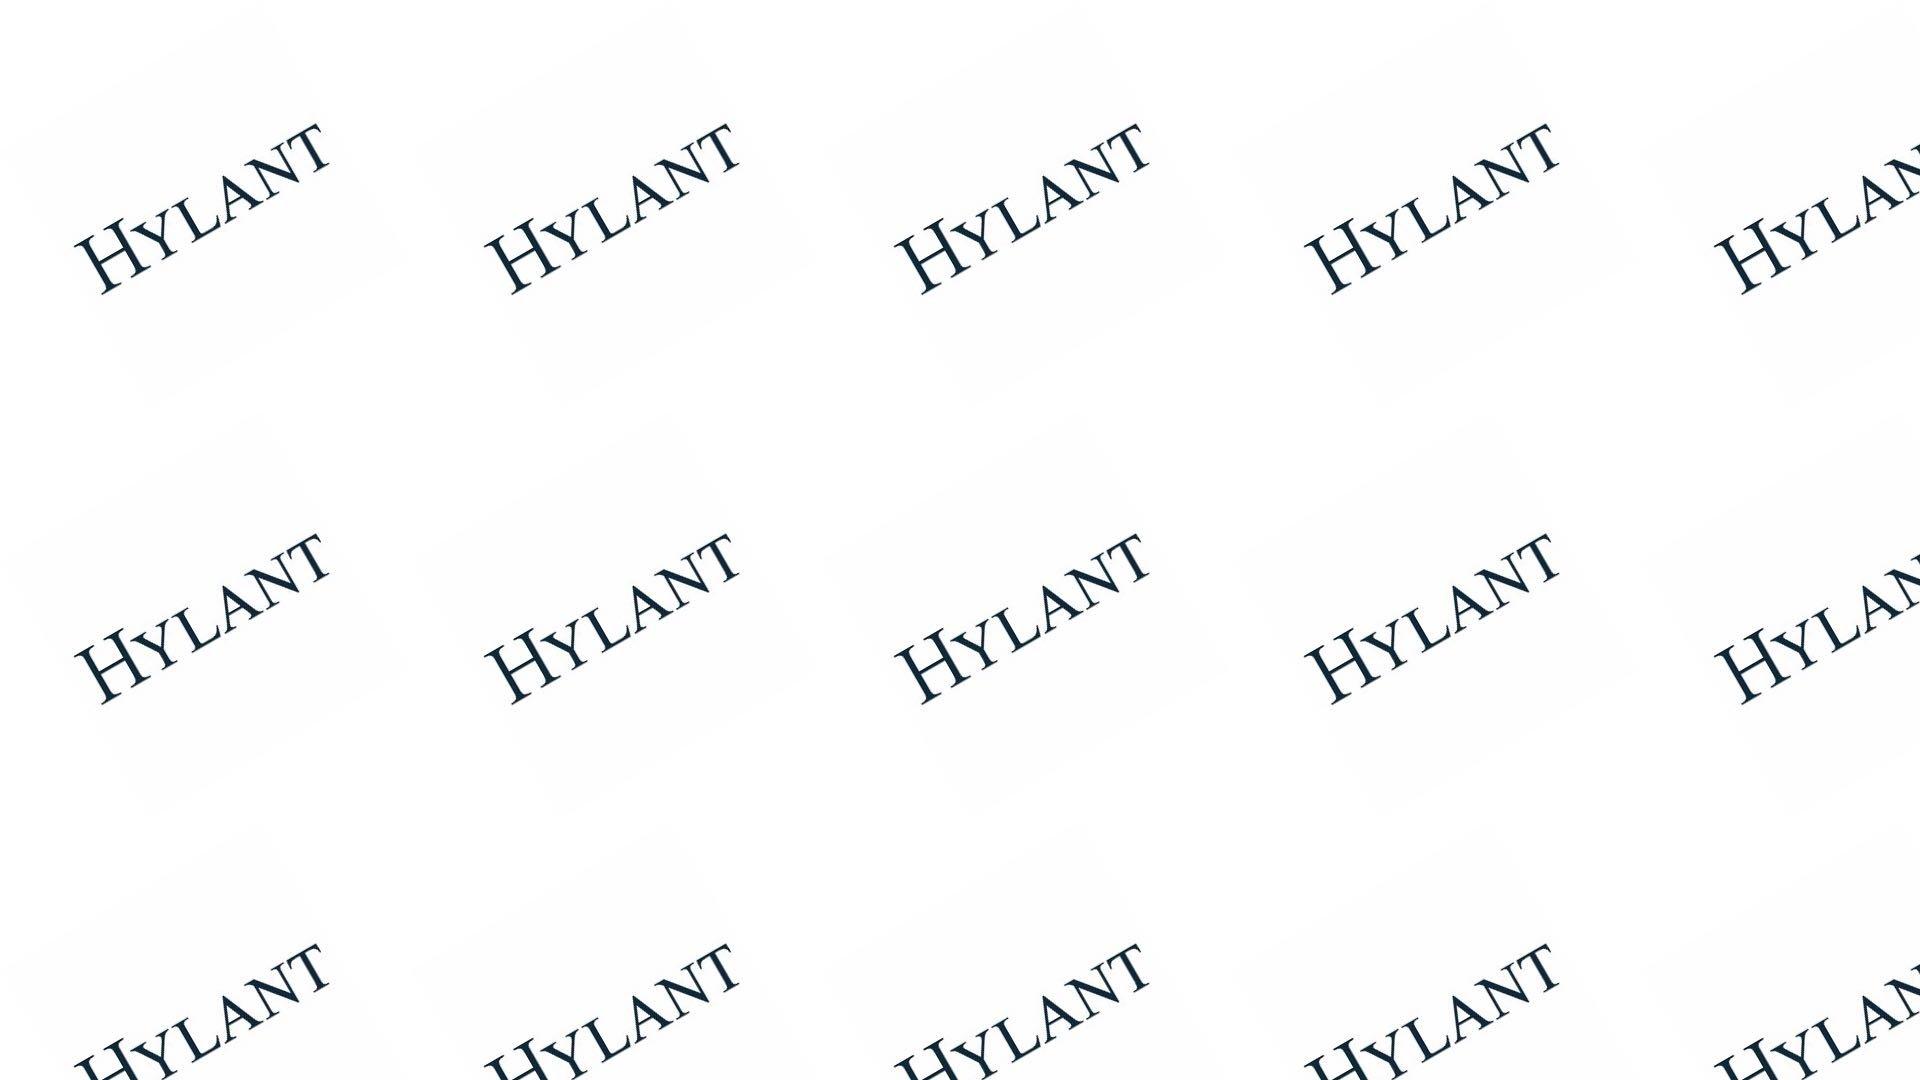 hylant site